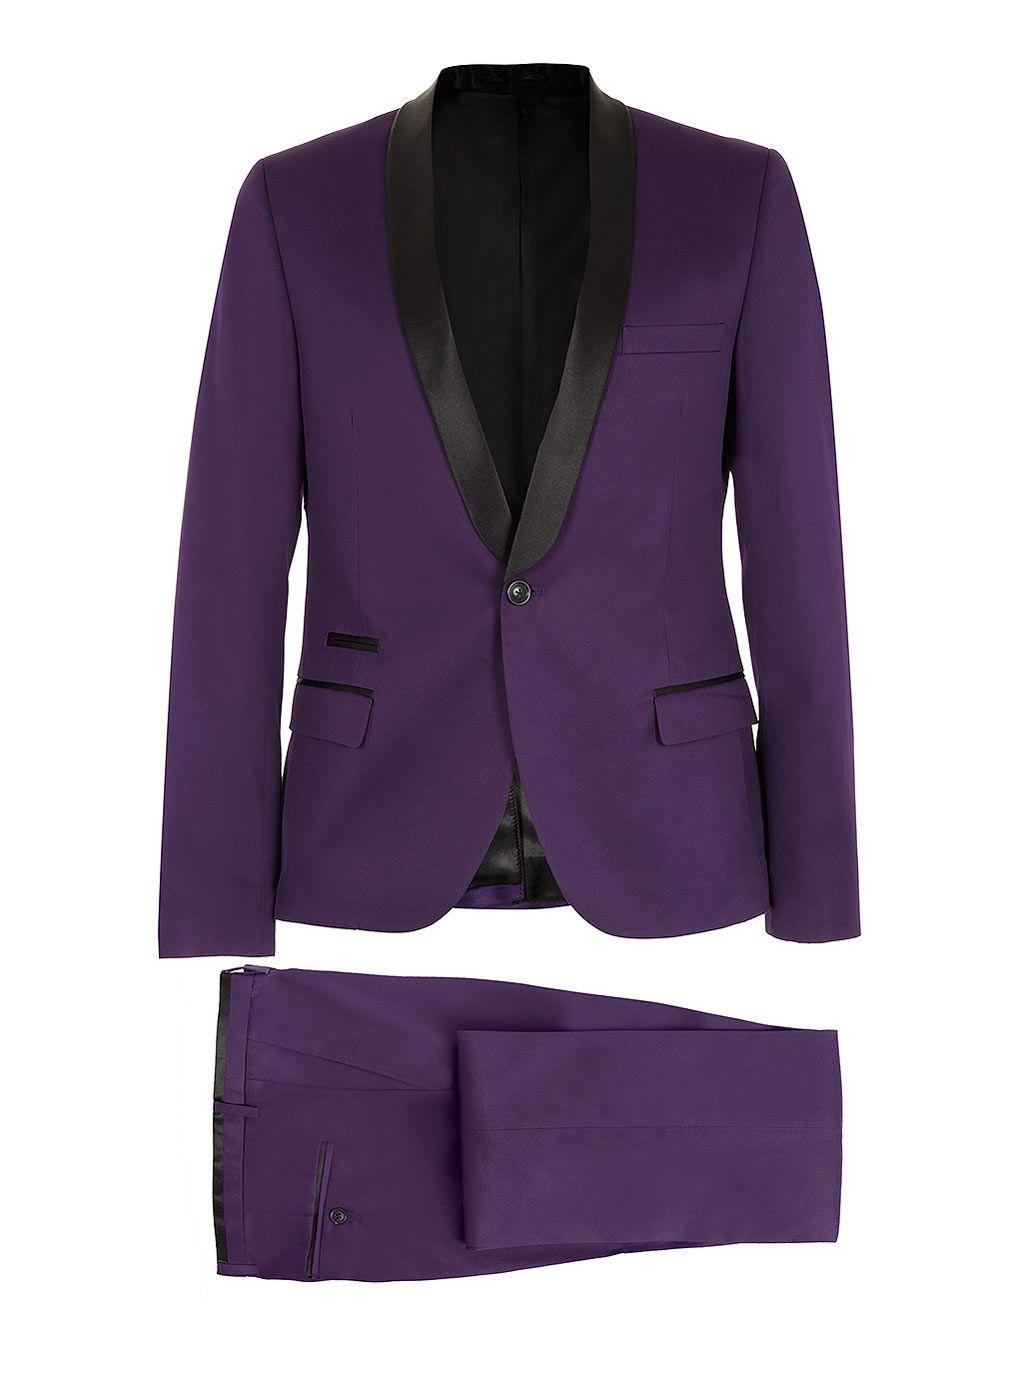 Topman-Purple-Skinny-Tux-Suit.jpg (1019×1384)2 | Willy Wonka ...